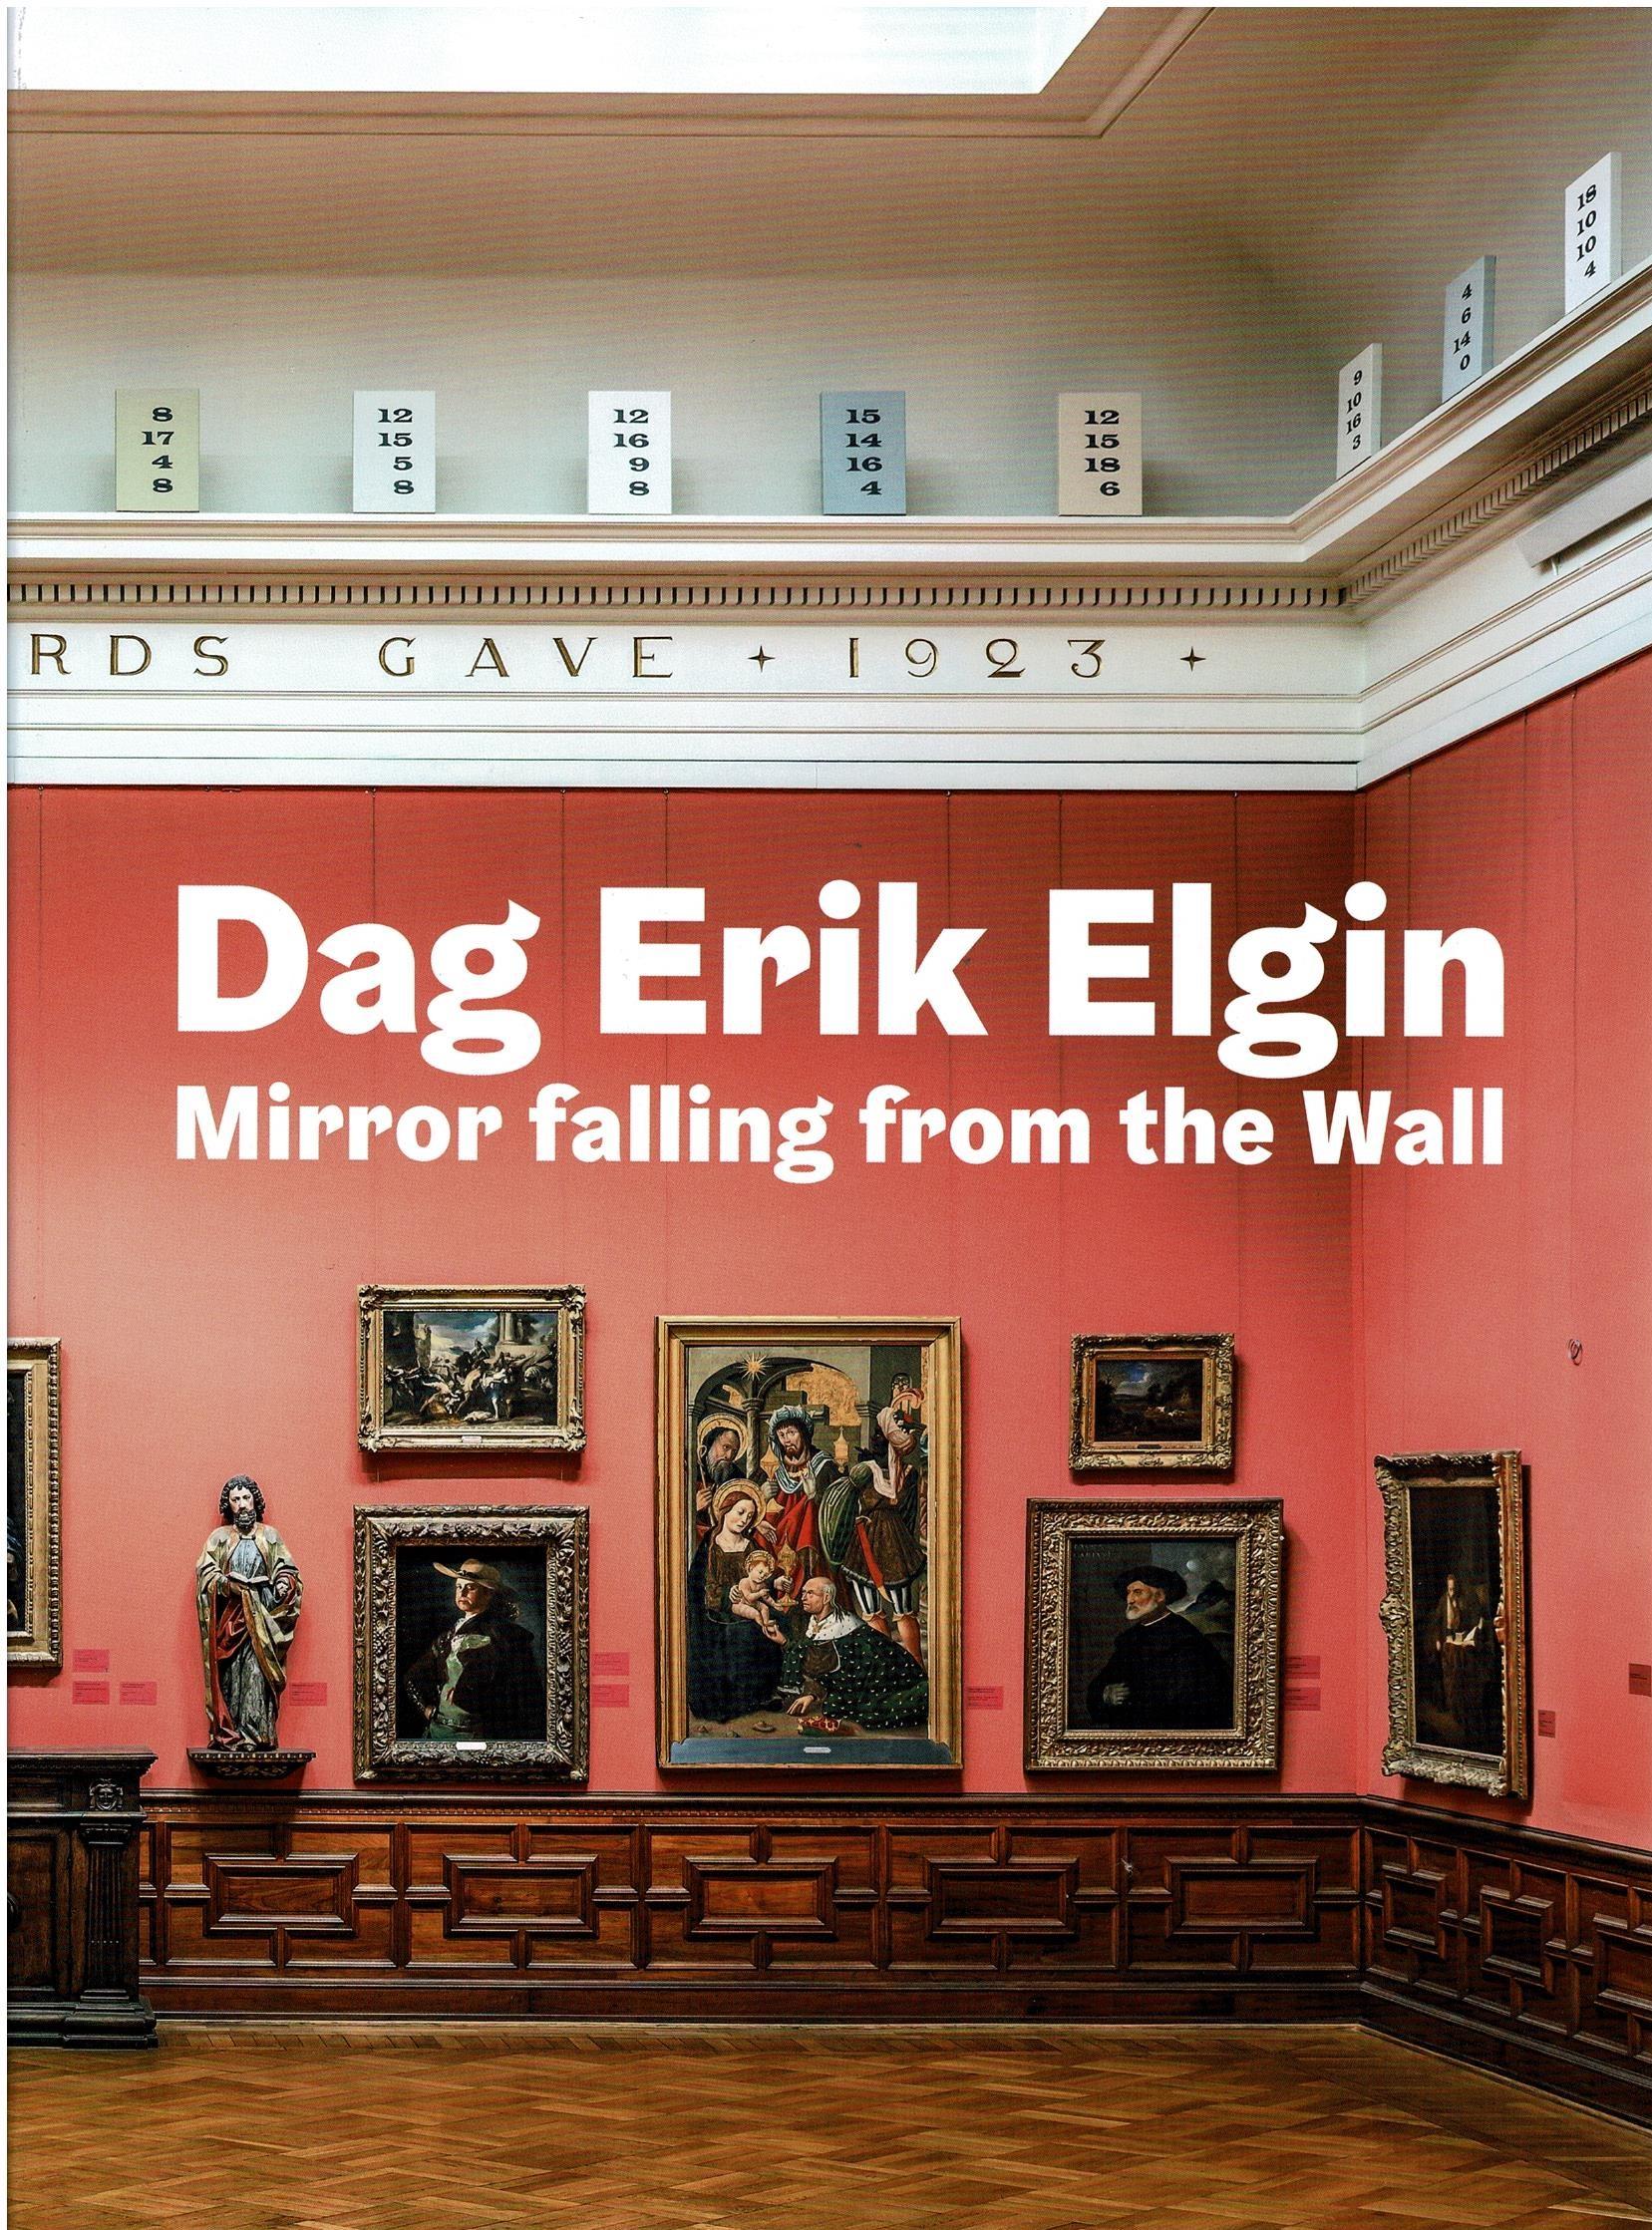 Mirror Falling From the Wall - Dag Erik Elgin